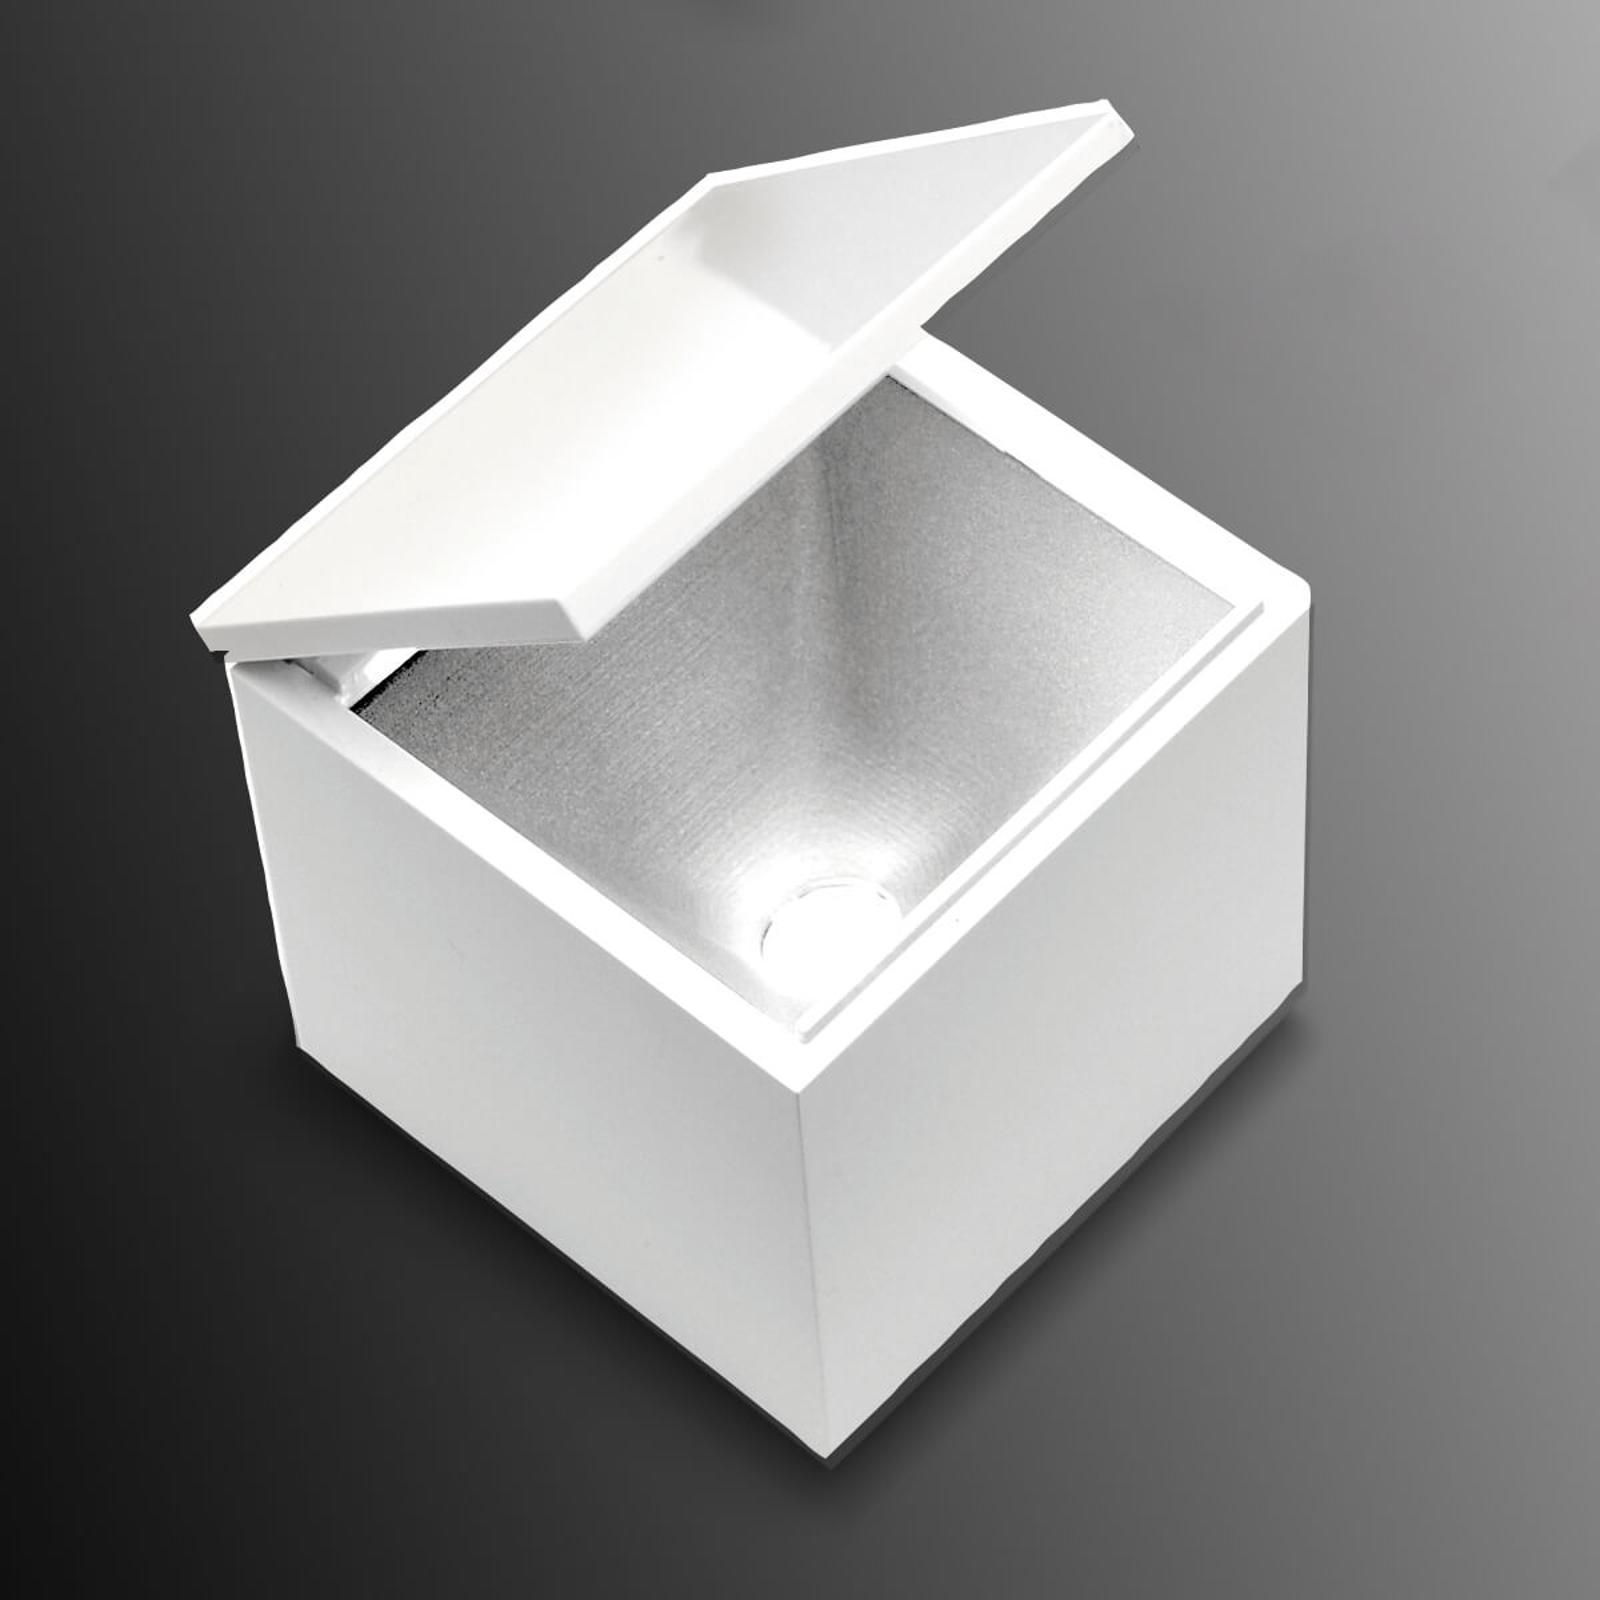 Cini&Nils Cuboled - LED-Tischleuchte in Weiß